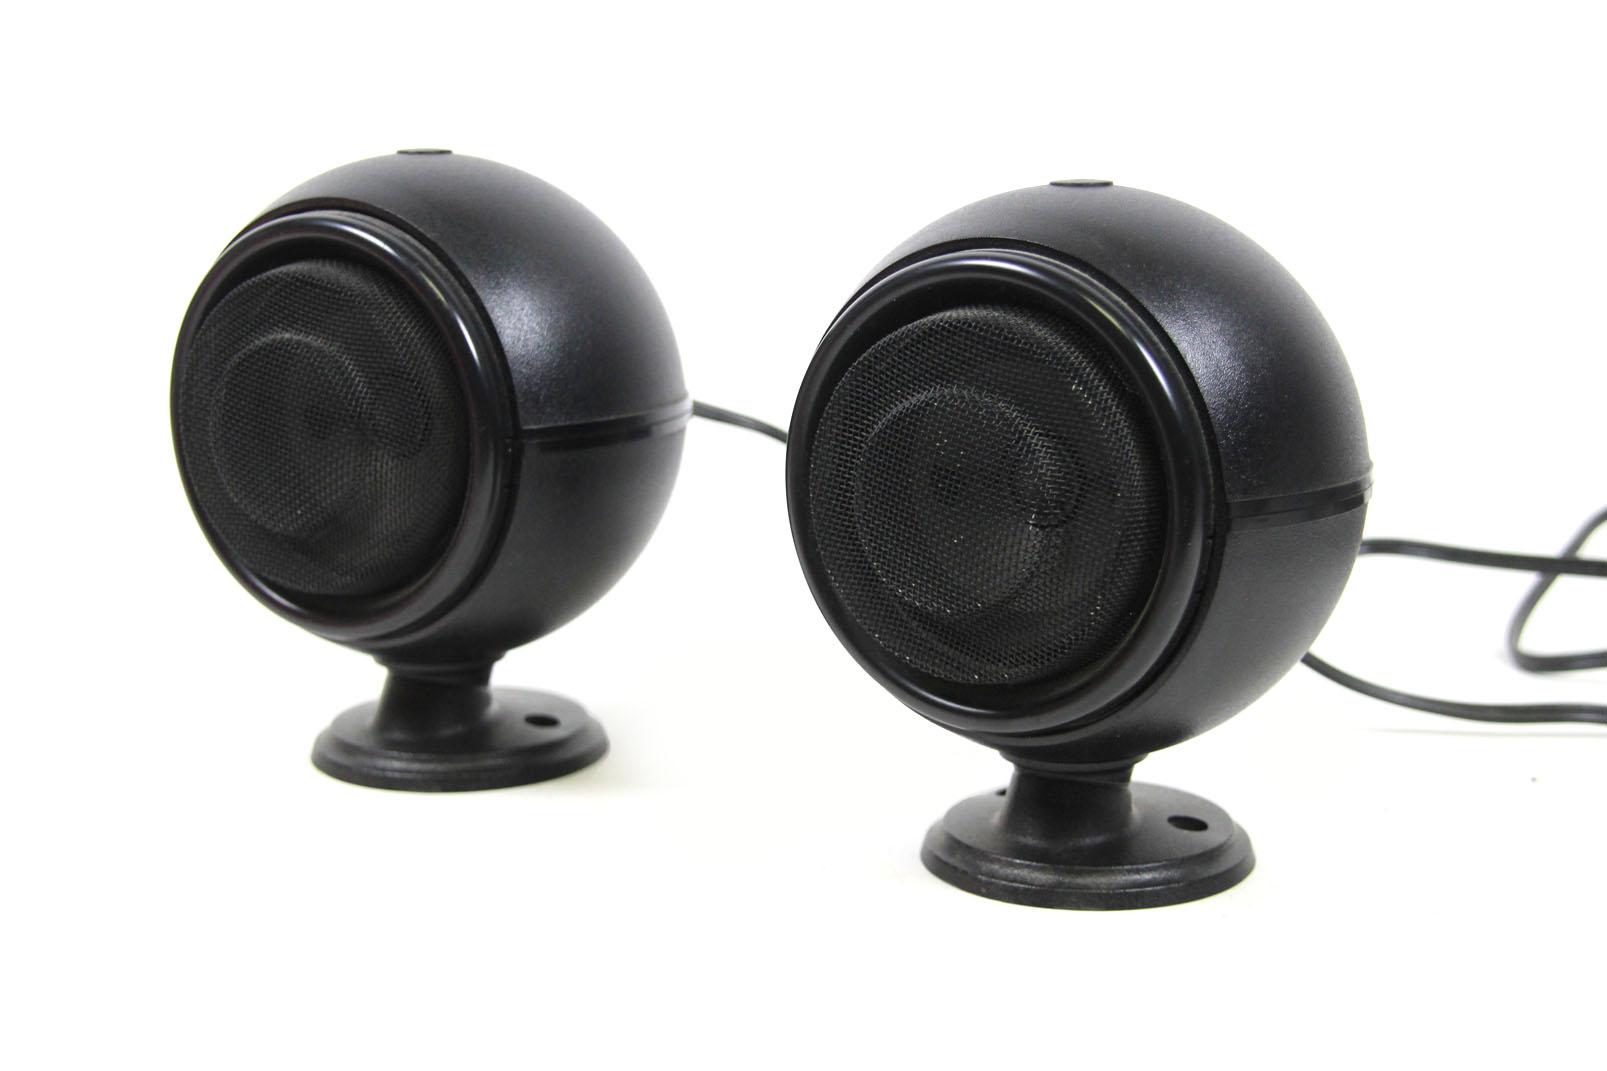 rft b7164 lautsprecher paar kfz hifi lautsprecher. Black Bedroom Furniture Sets. Home Design Ideas